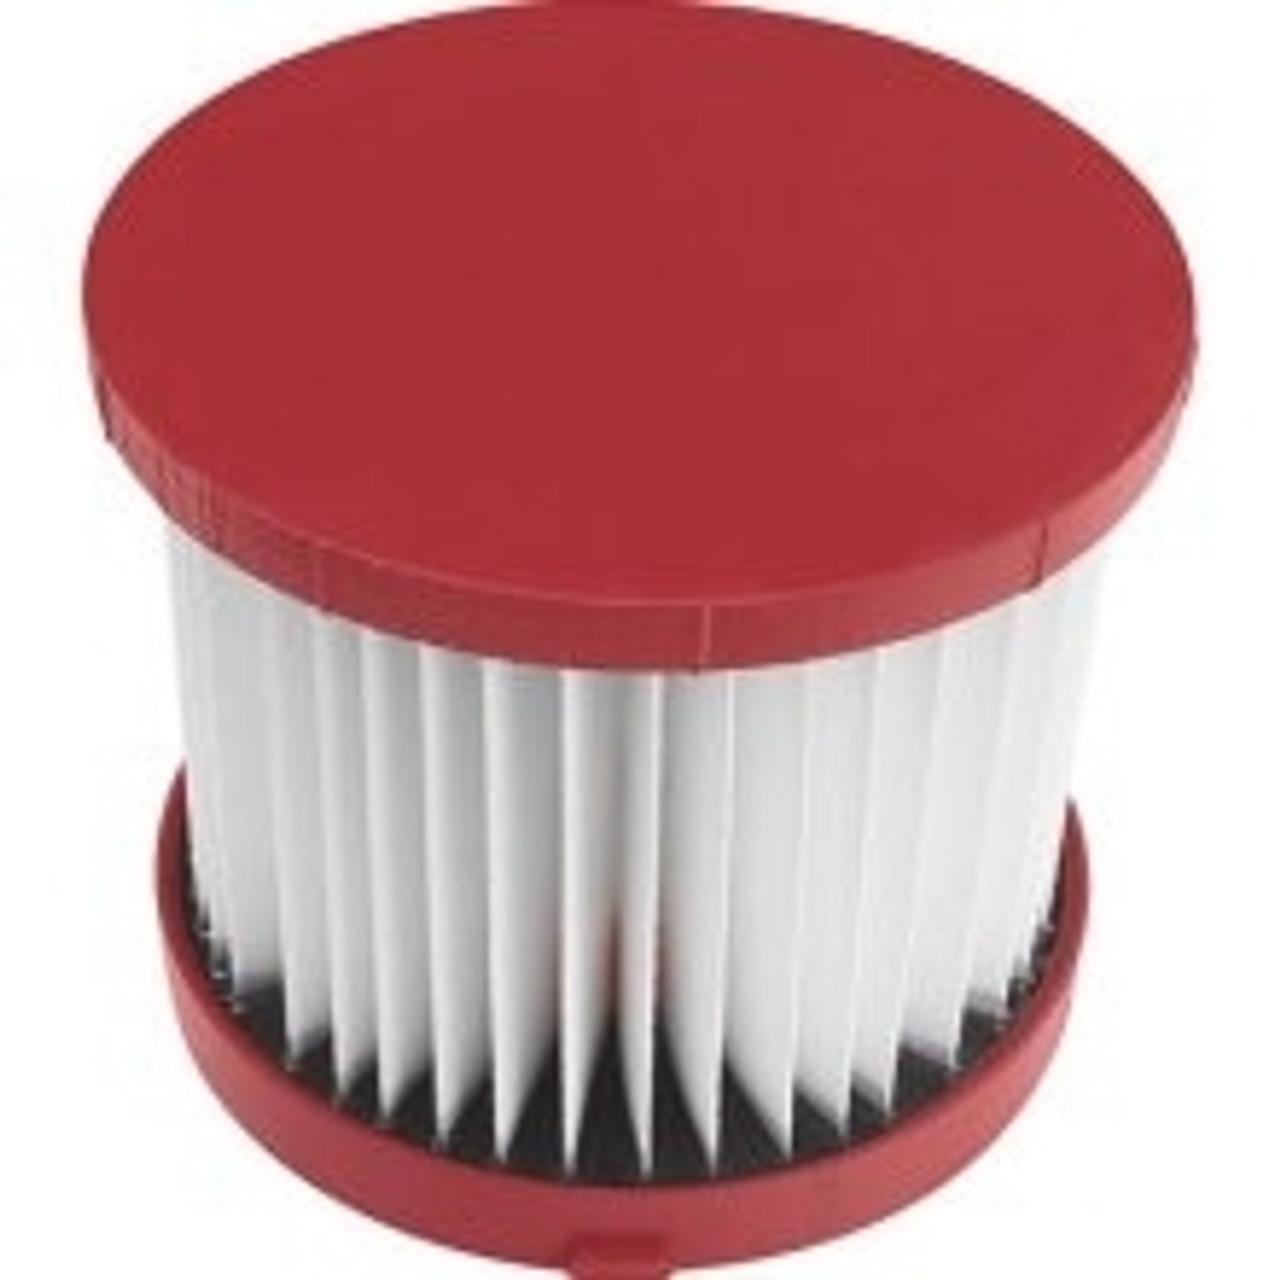 Milwaukee 49-90-1900 HEPA Filter for Wet/Dry VAC